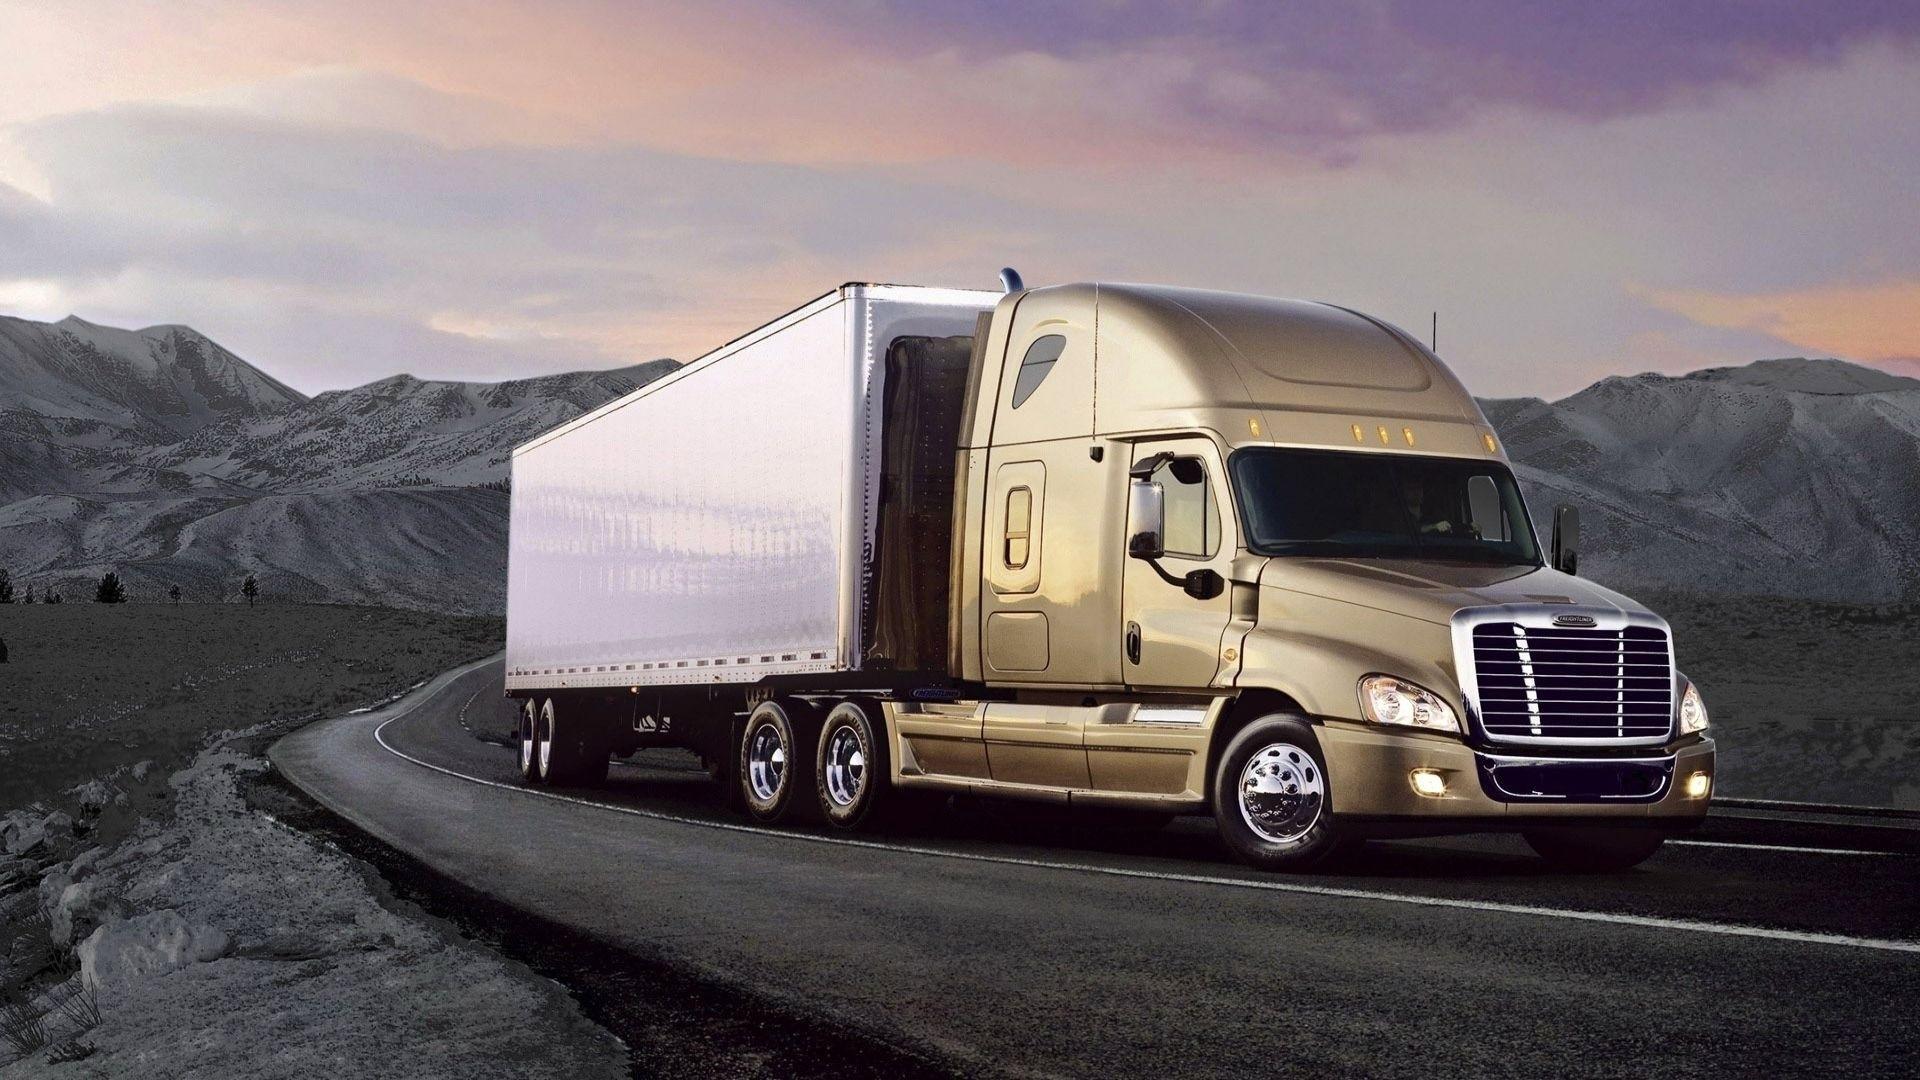 Truck Wallpaper Picture hd